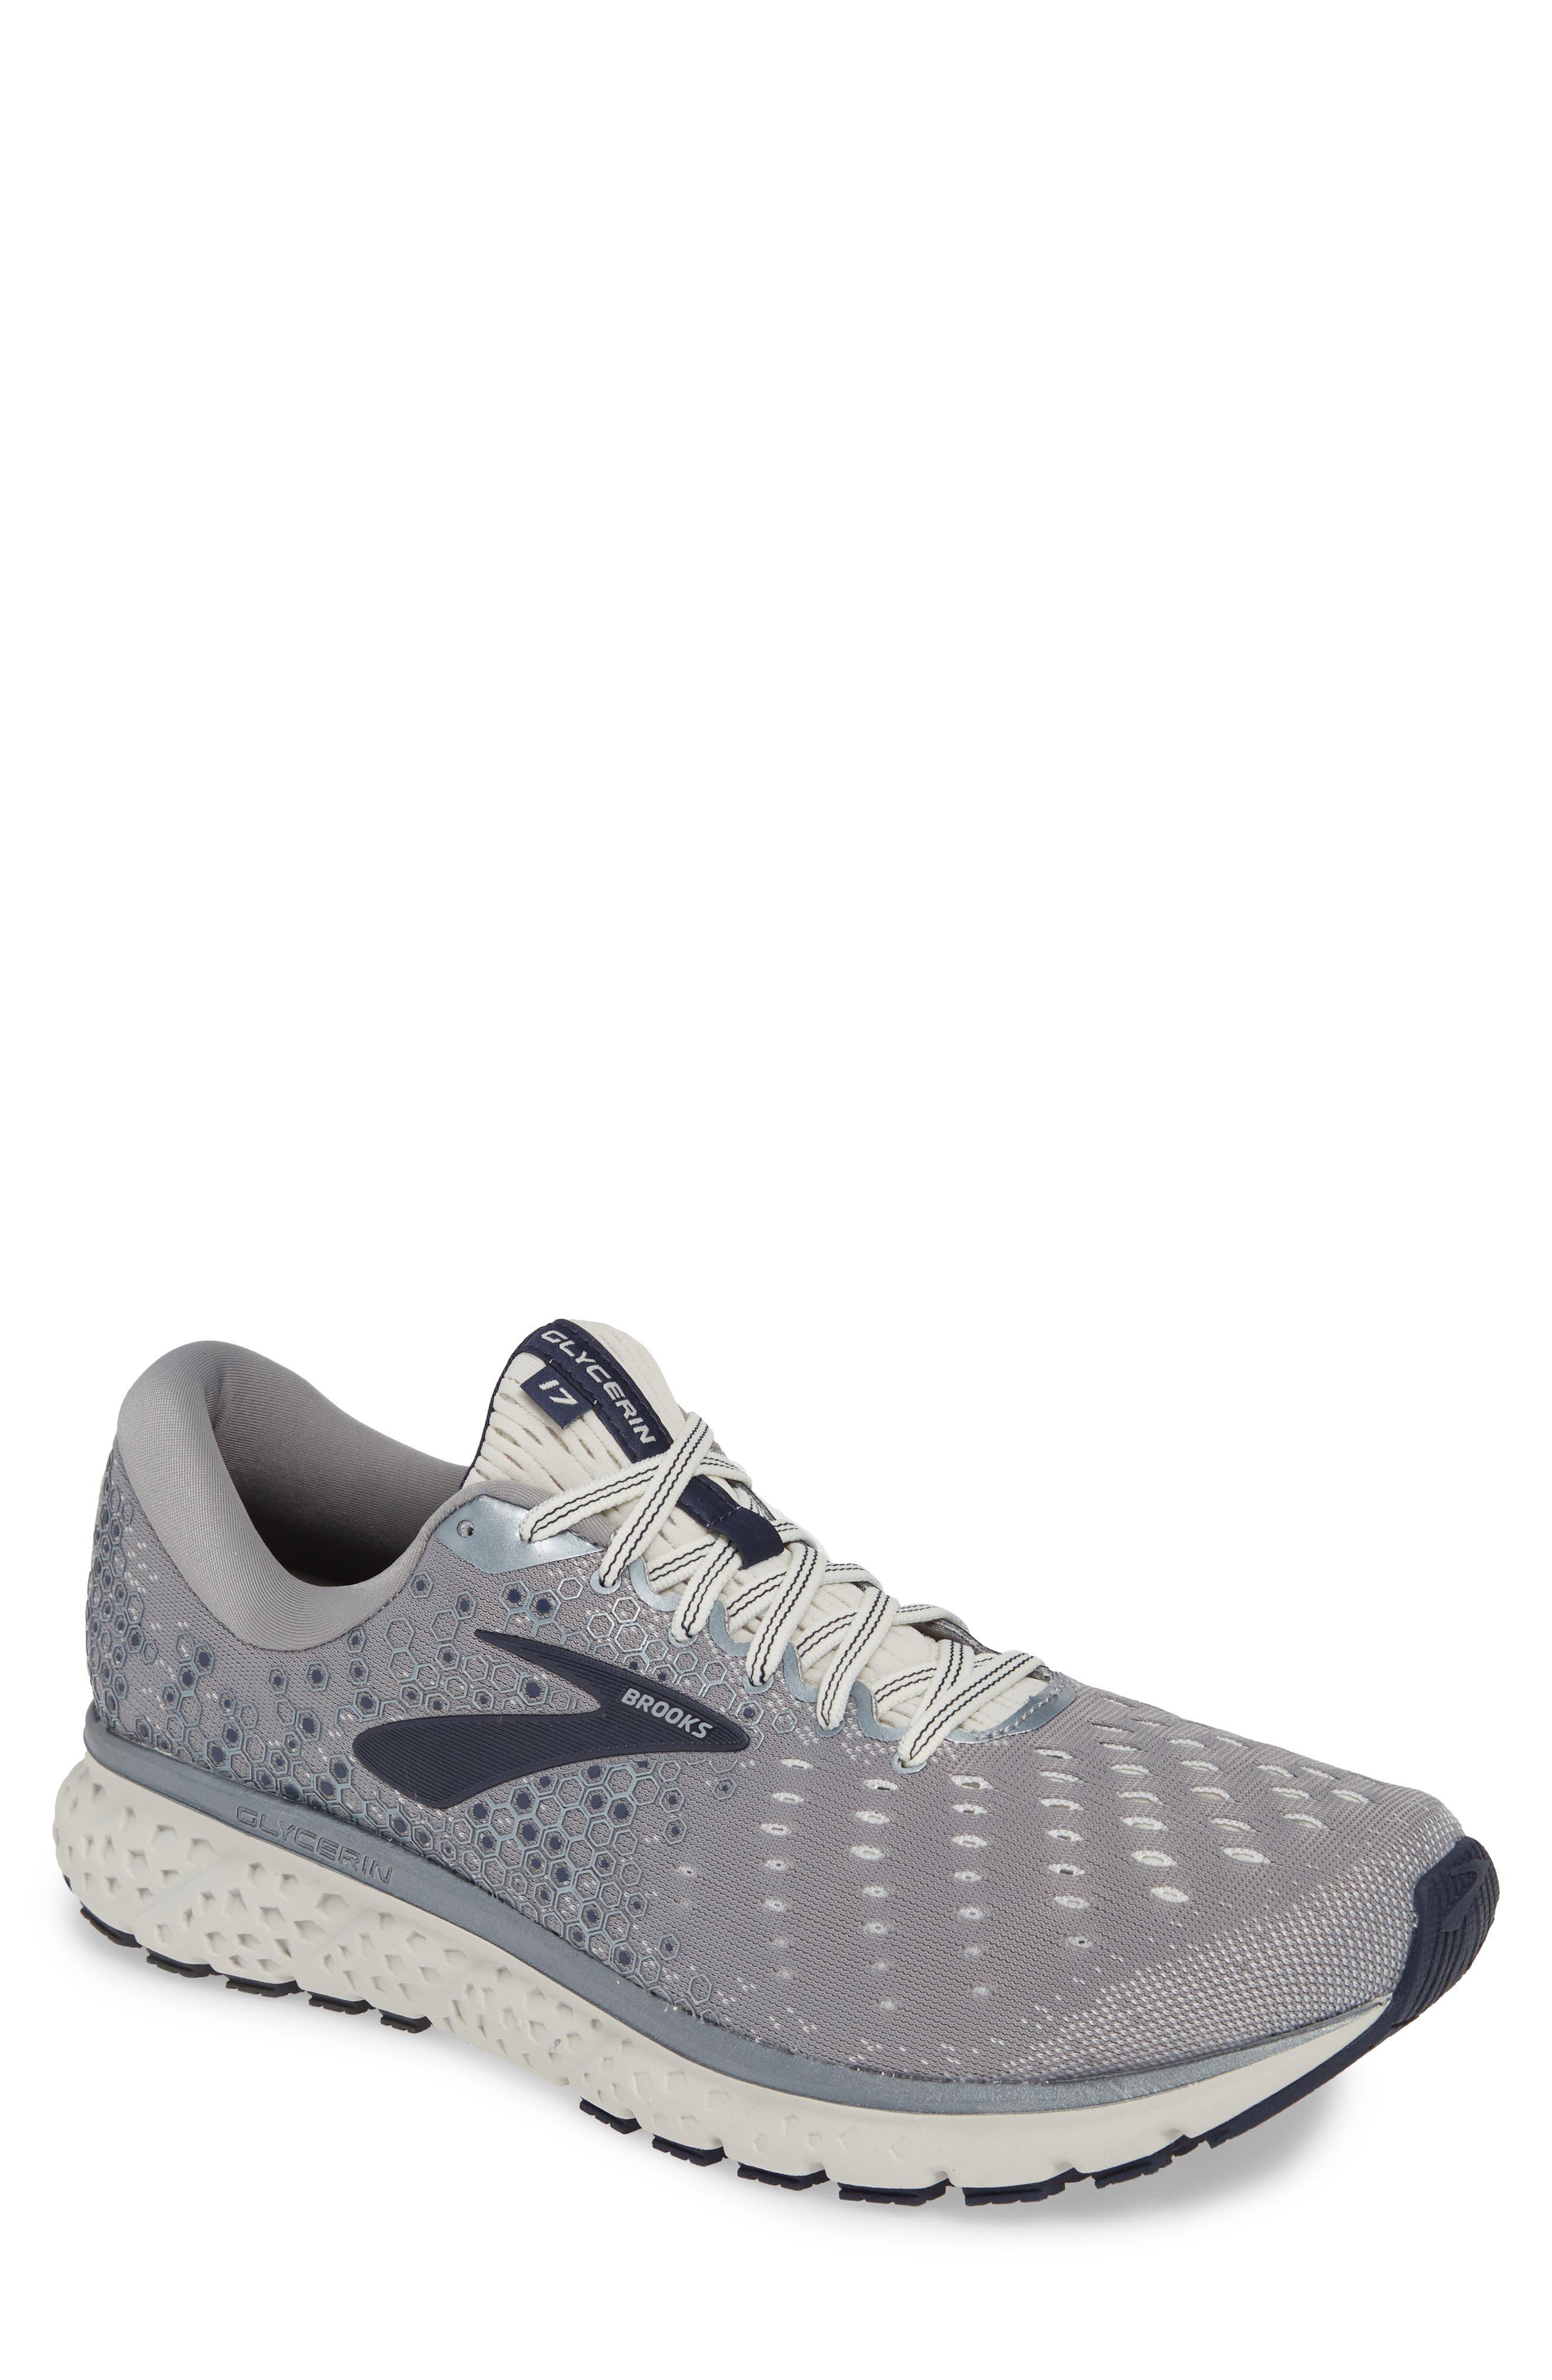 Brooks Glycerin 17 Running Shoe - Grey